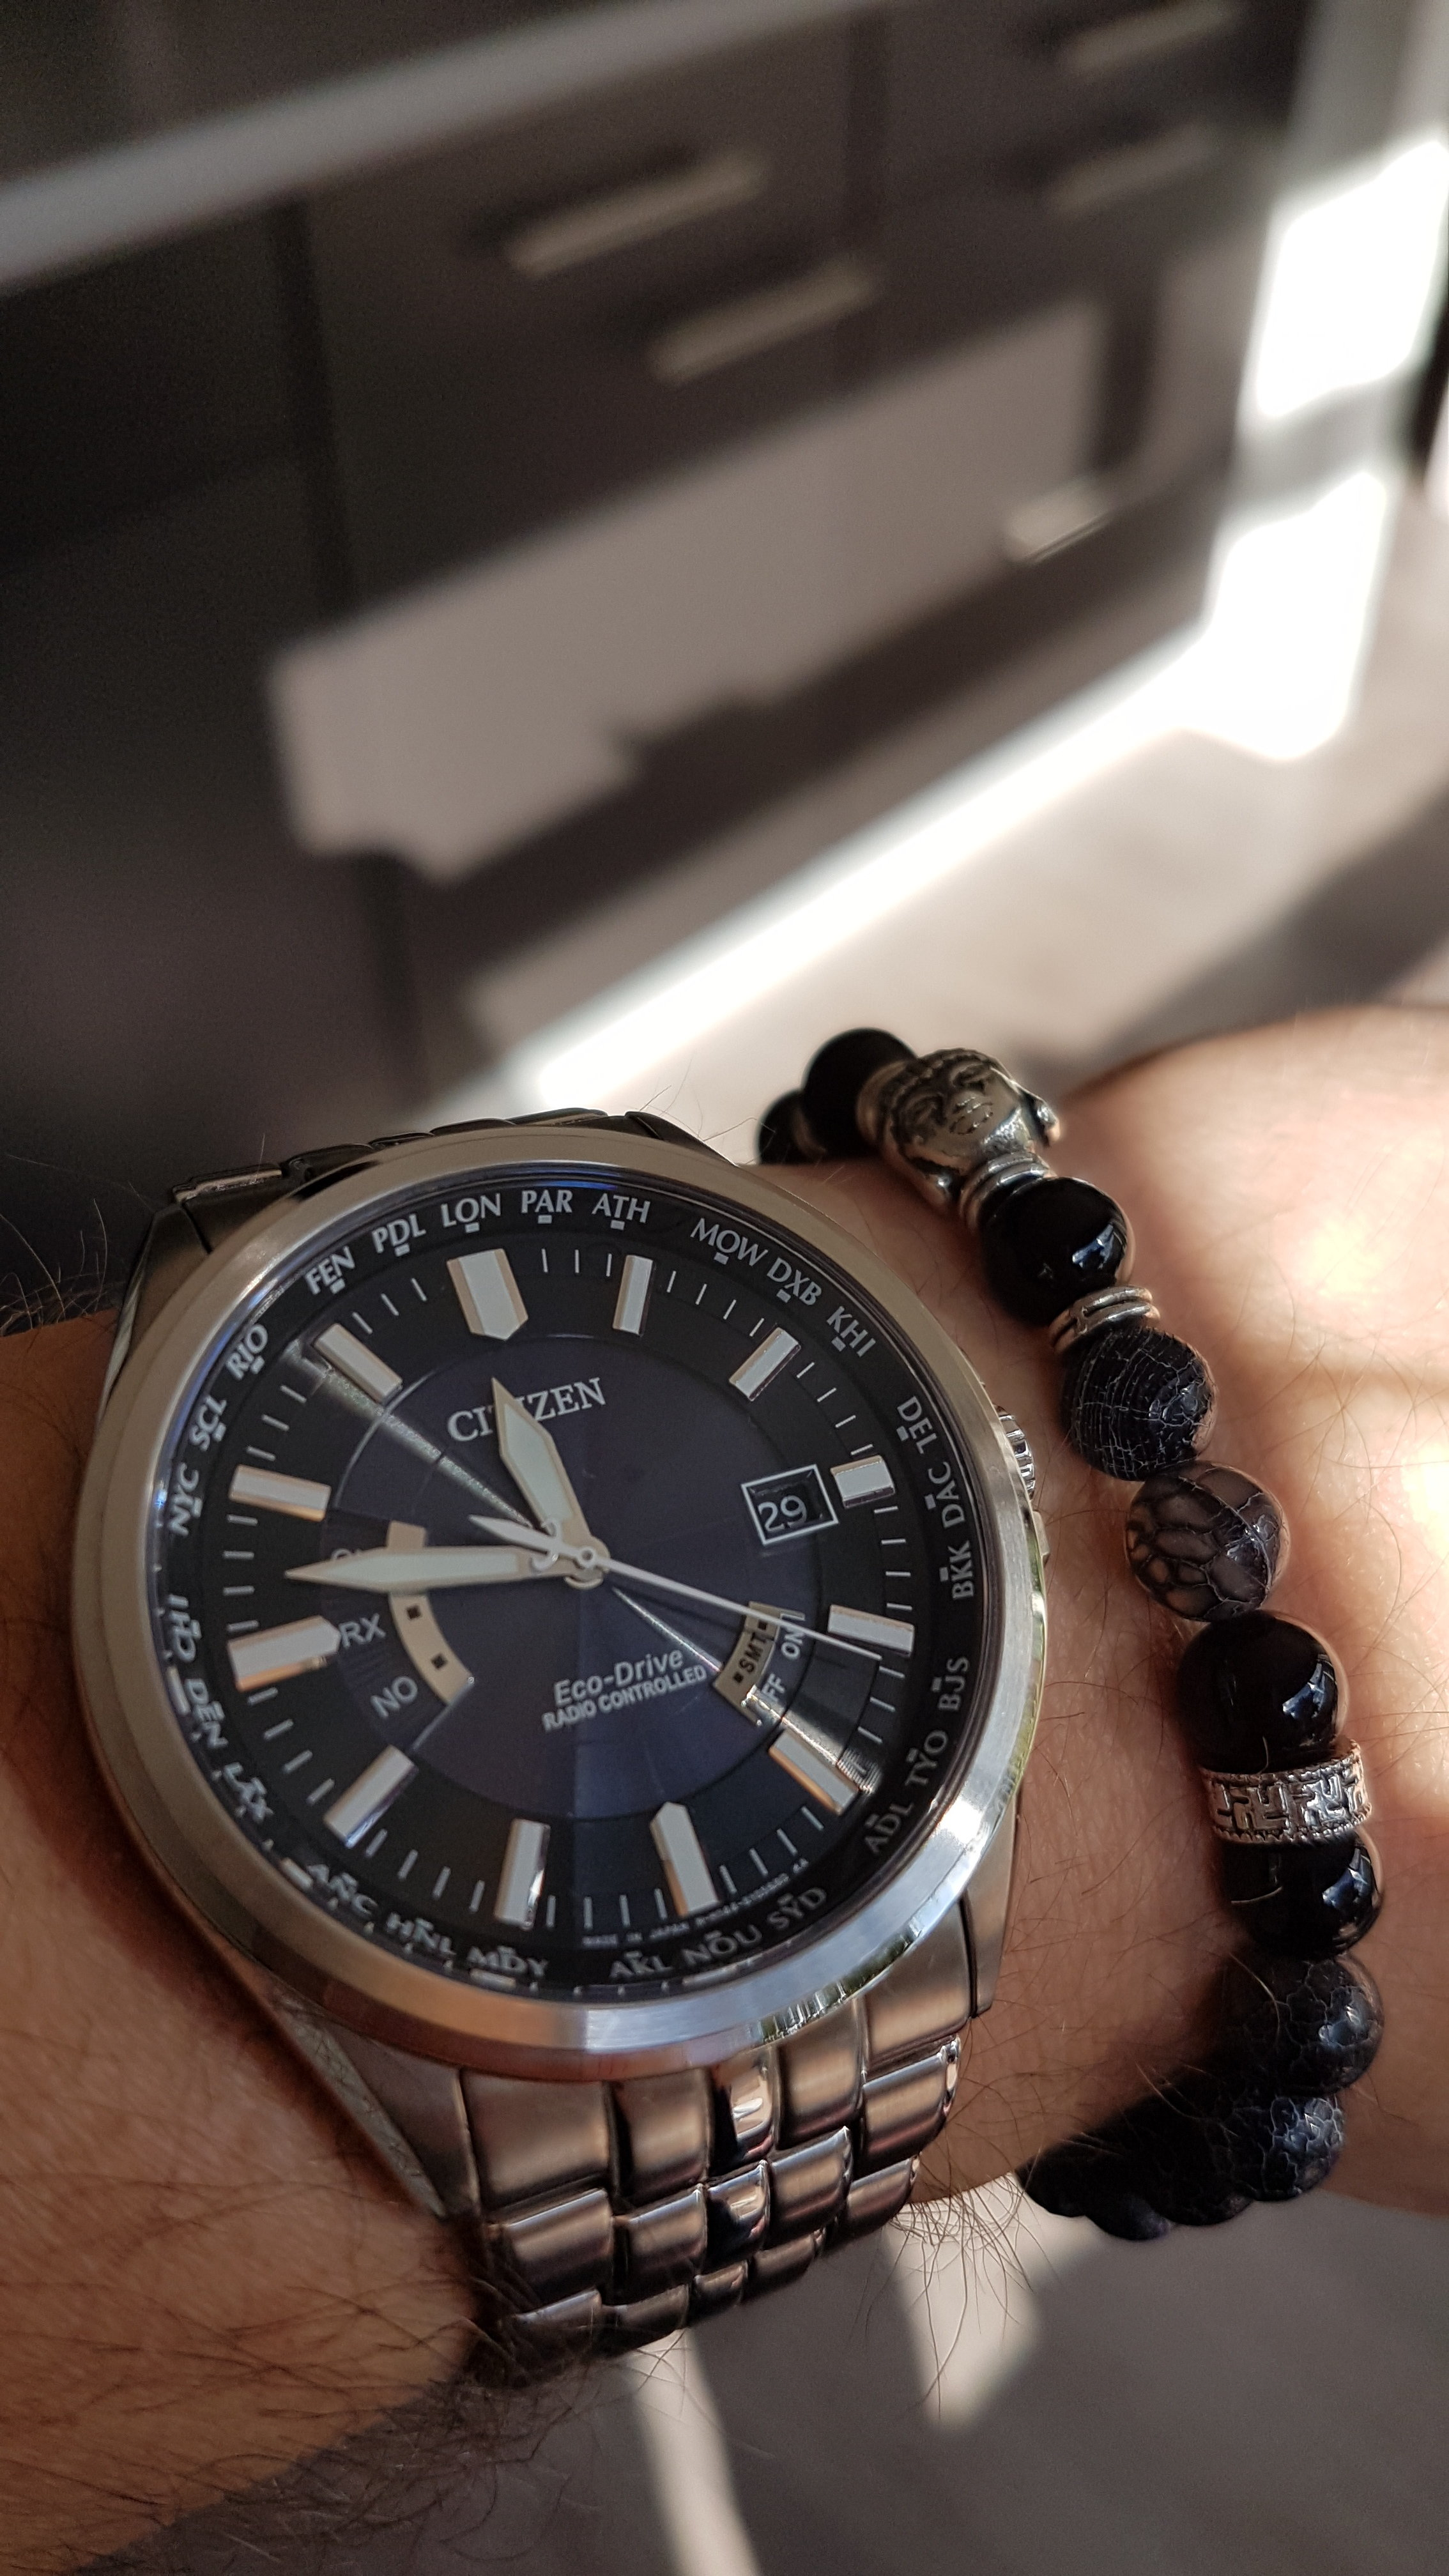 Horloge Dunne Pols Algemene Horlogepraat Horlogeforumnl